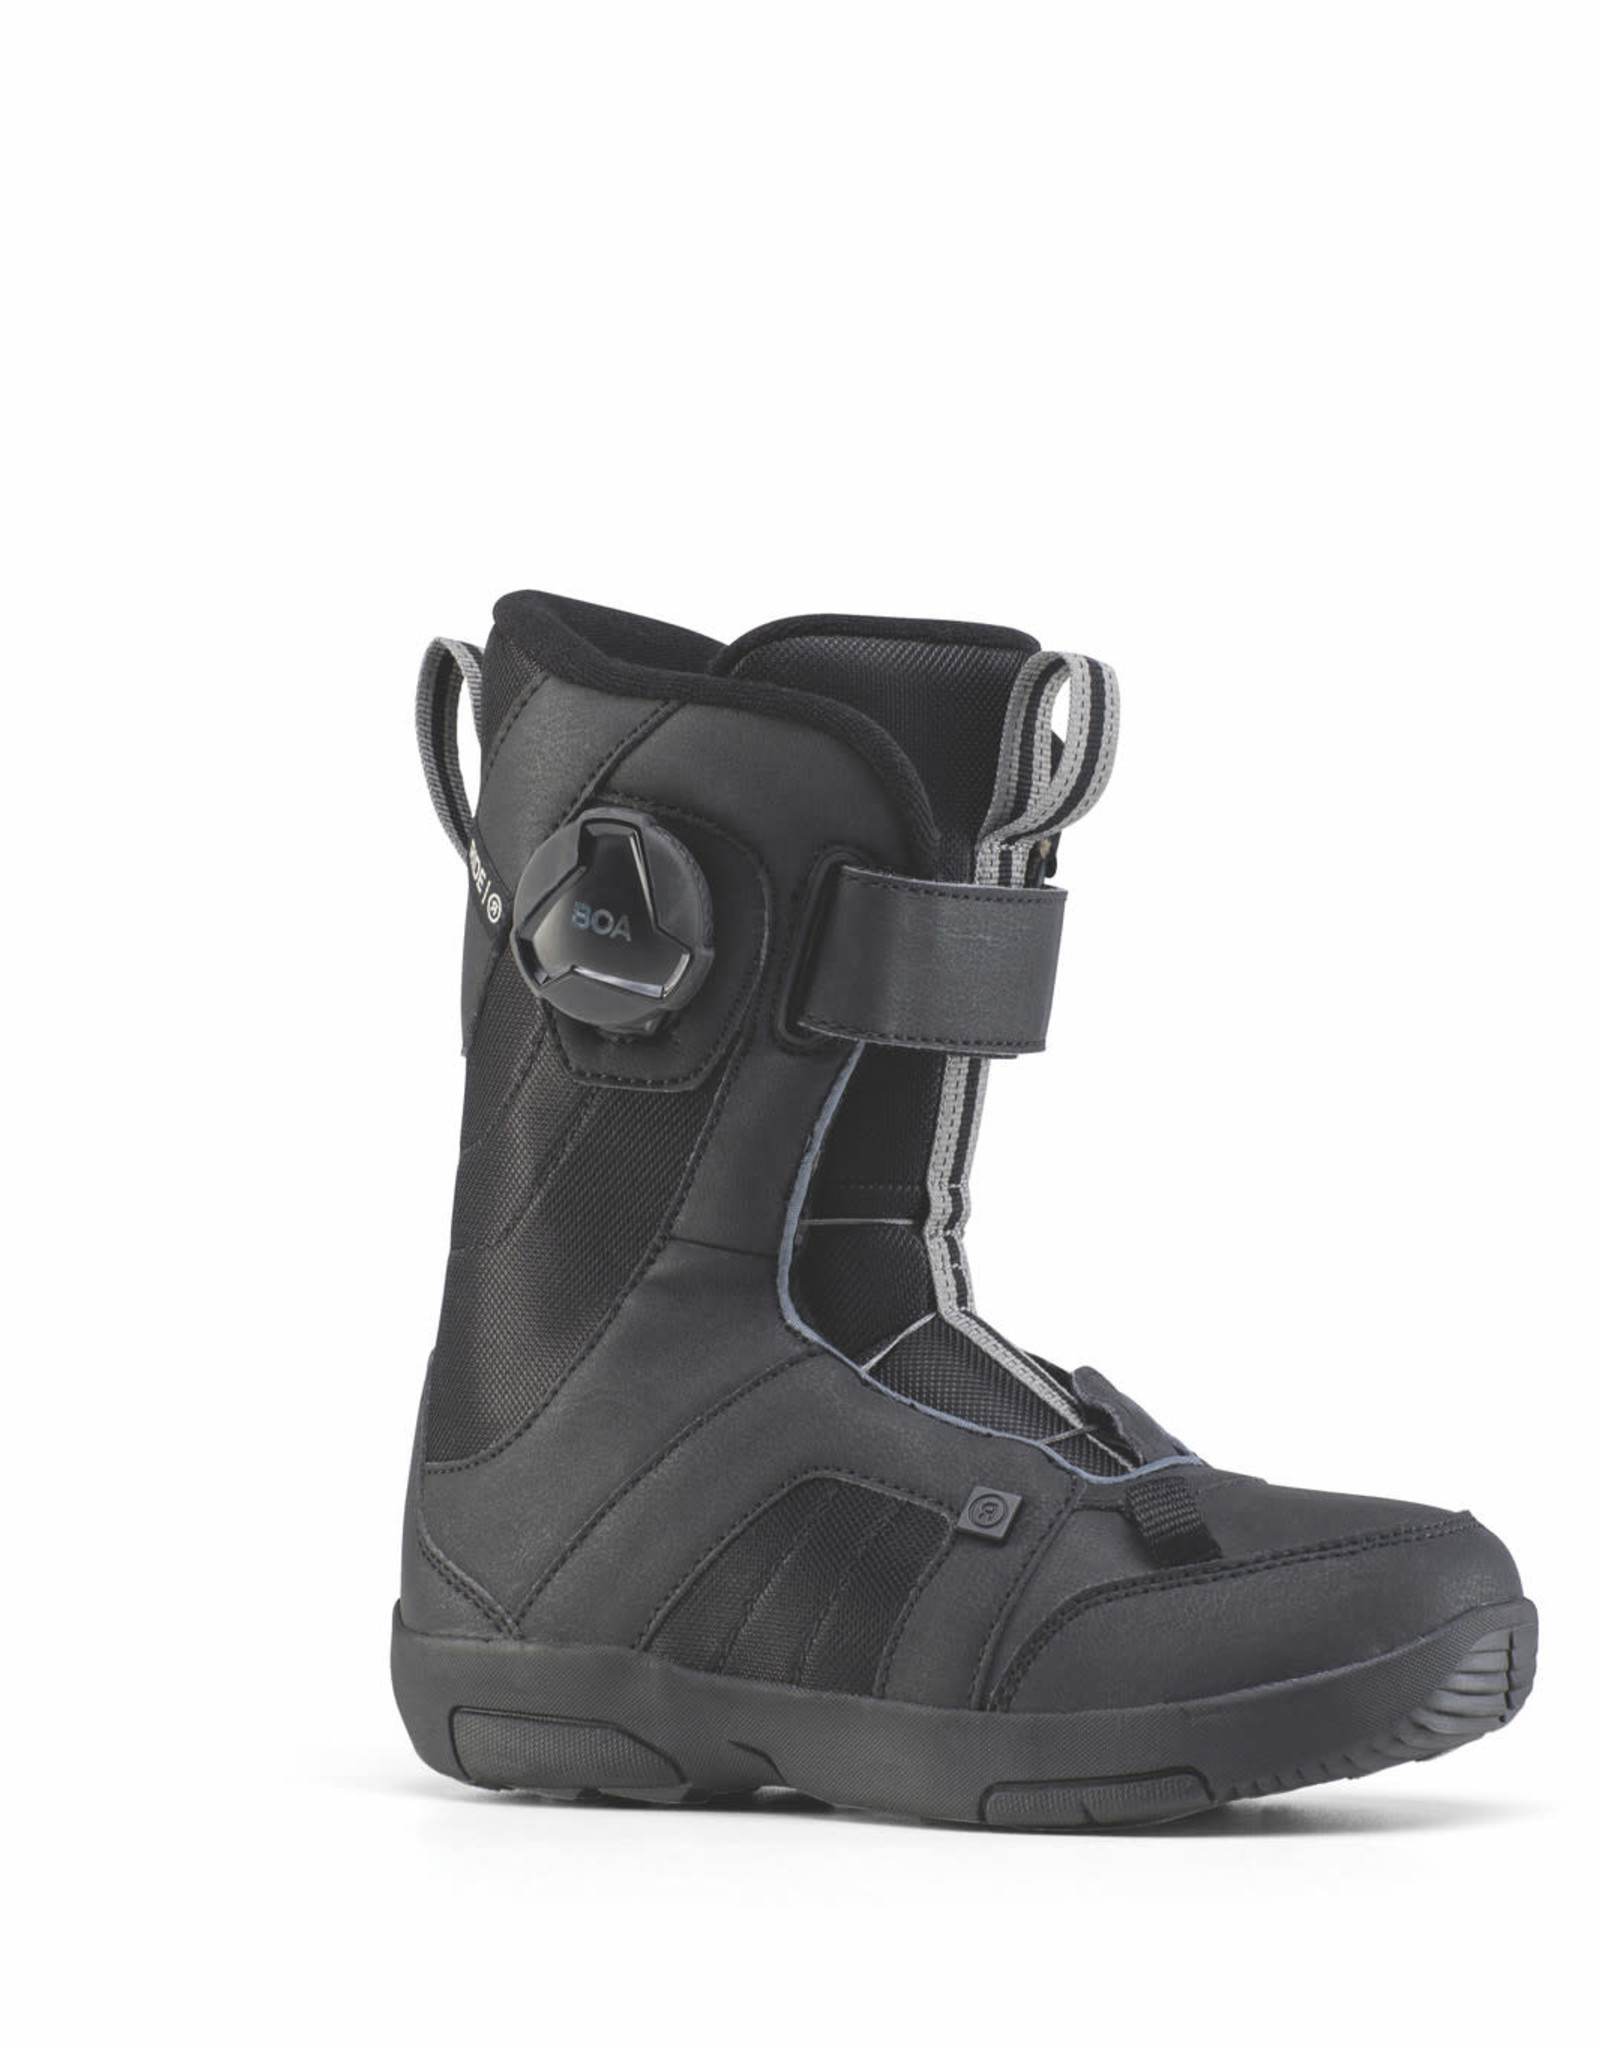 RIDE Ride Norris JR Snowboard Boot